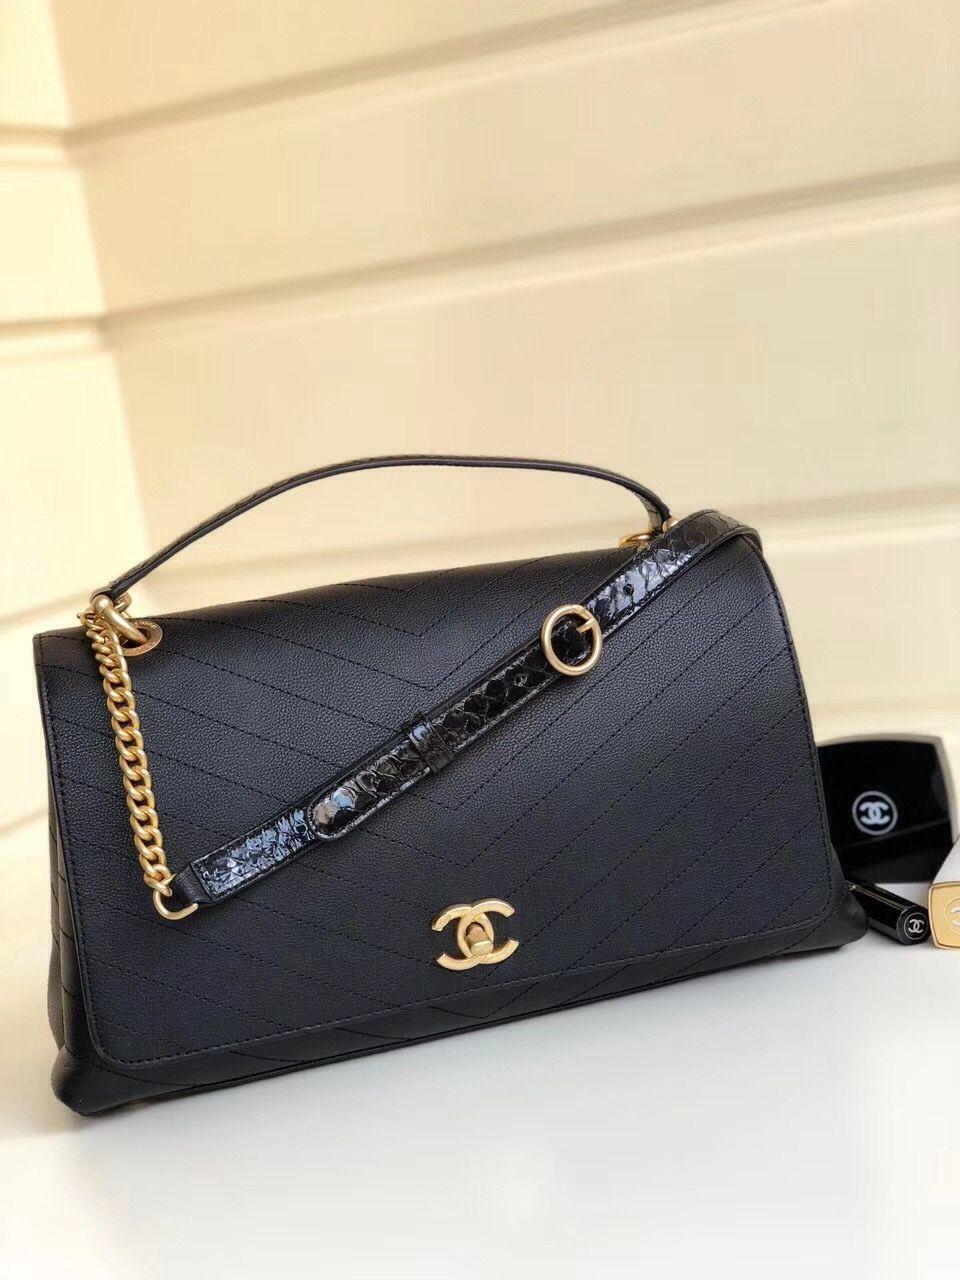 Chanel Calfskin Chevron Chic Large Top Handle Bag A57149 Black 2018 Chanel Handbags Designer Bags For Less Bags